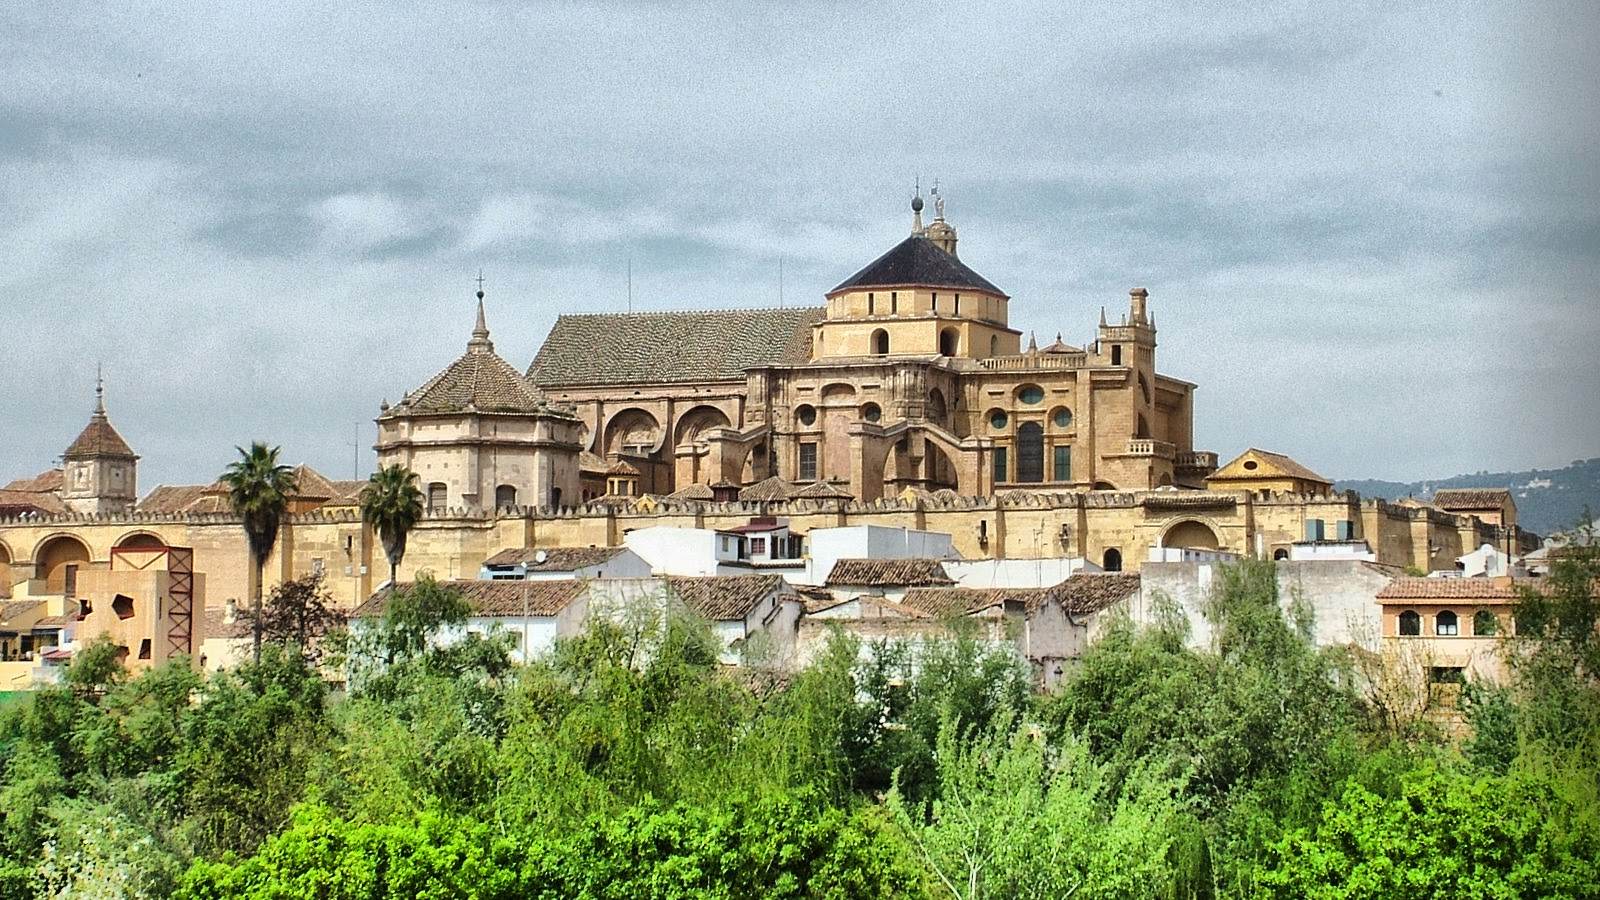 Conociendo el mundo mezquita catedral de cordoba for Exterior mezquita de cordoba